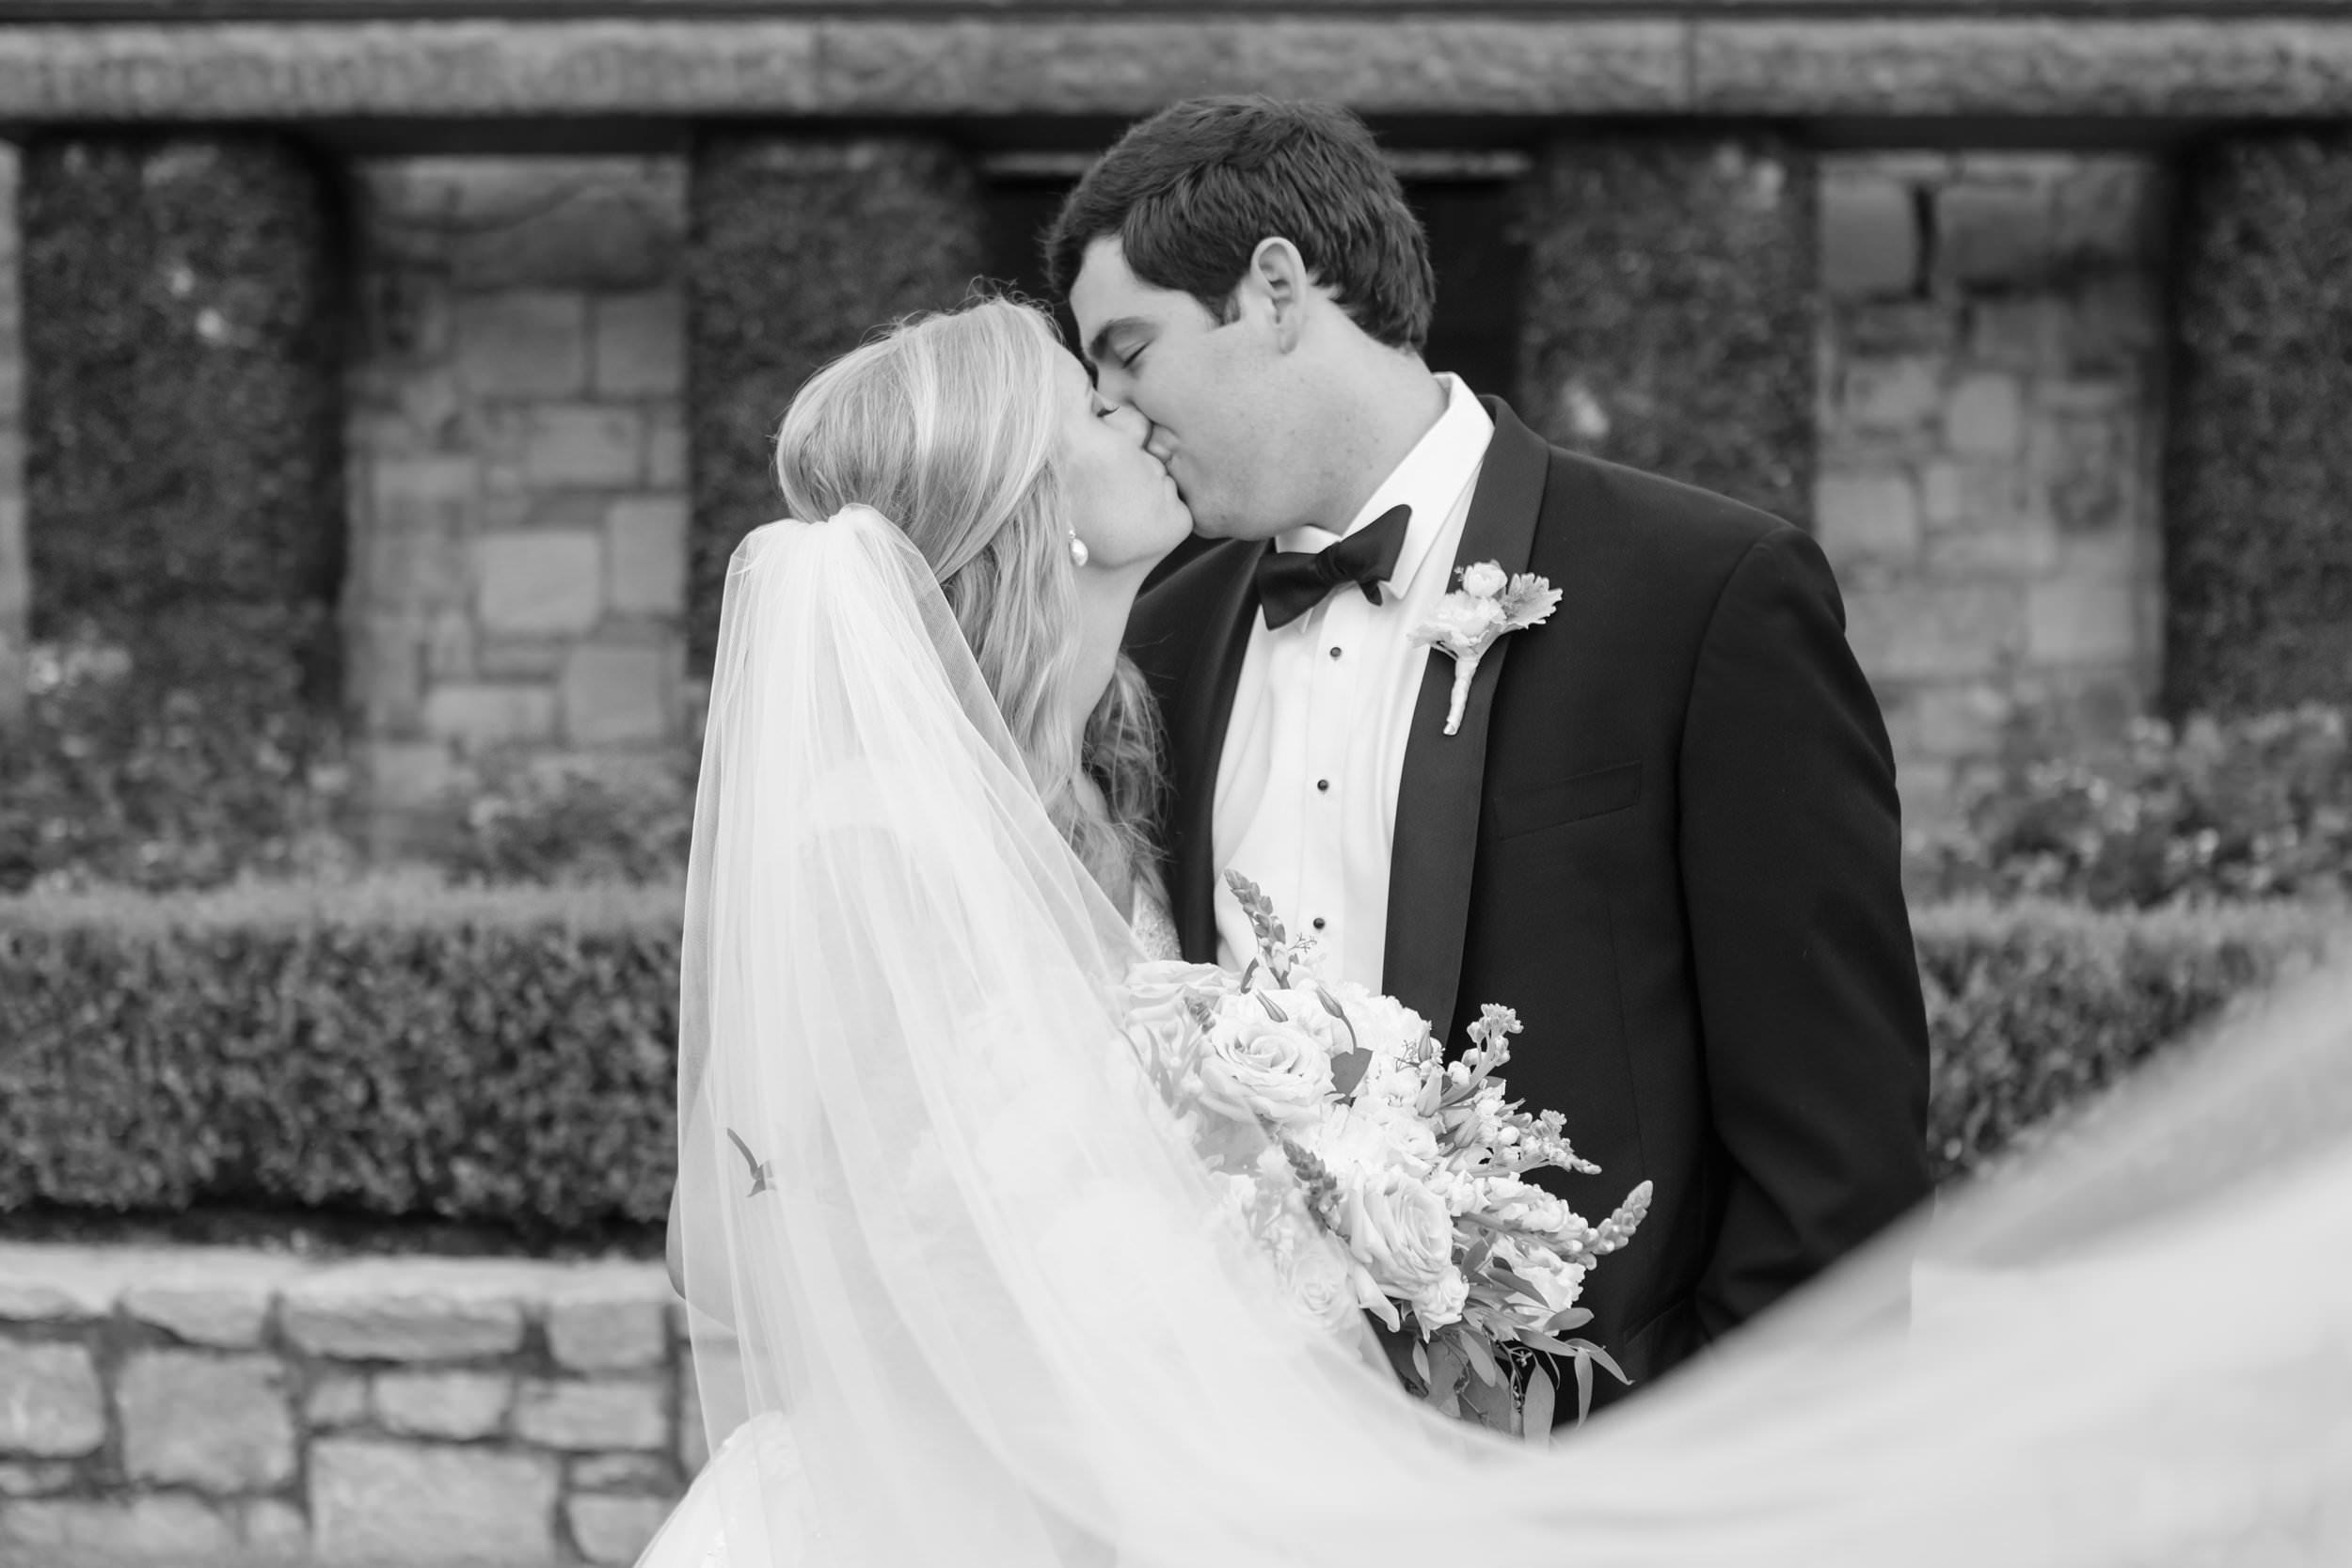 Piedmont-Driving-Club-Wedding-Photos035.jpg